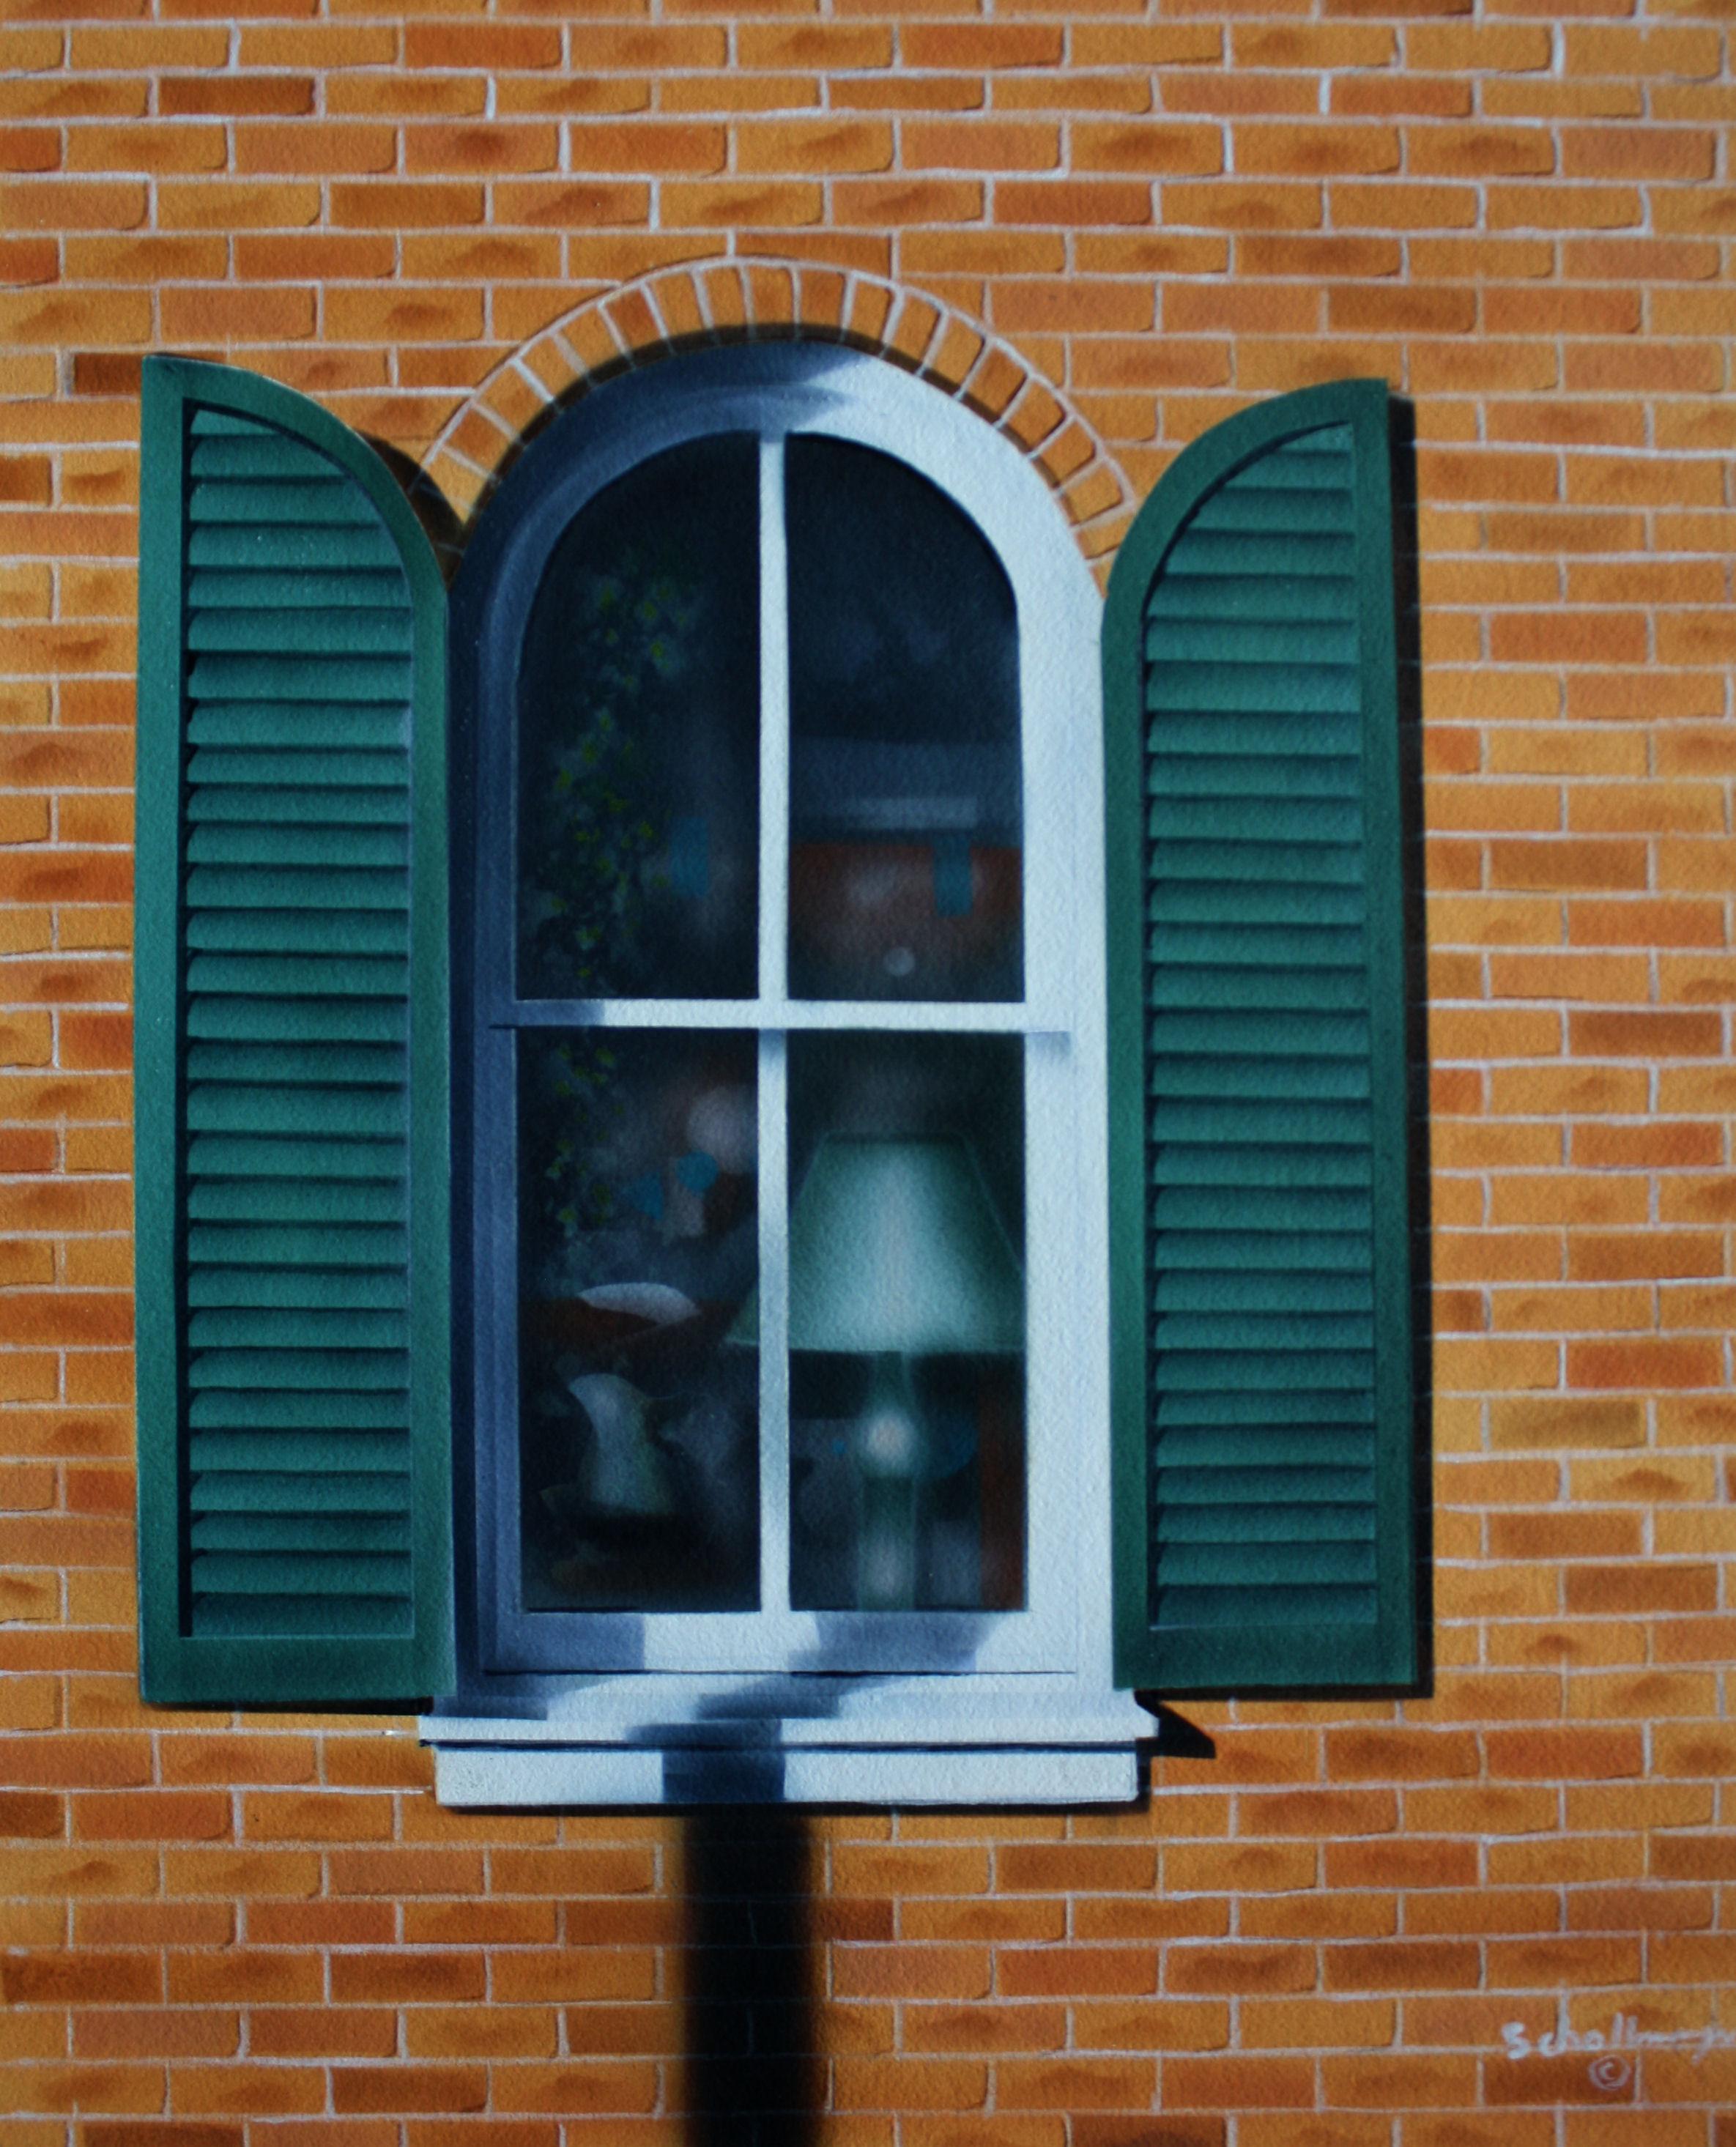 East Window (Mid-morning)